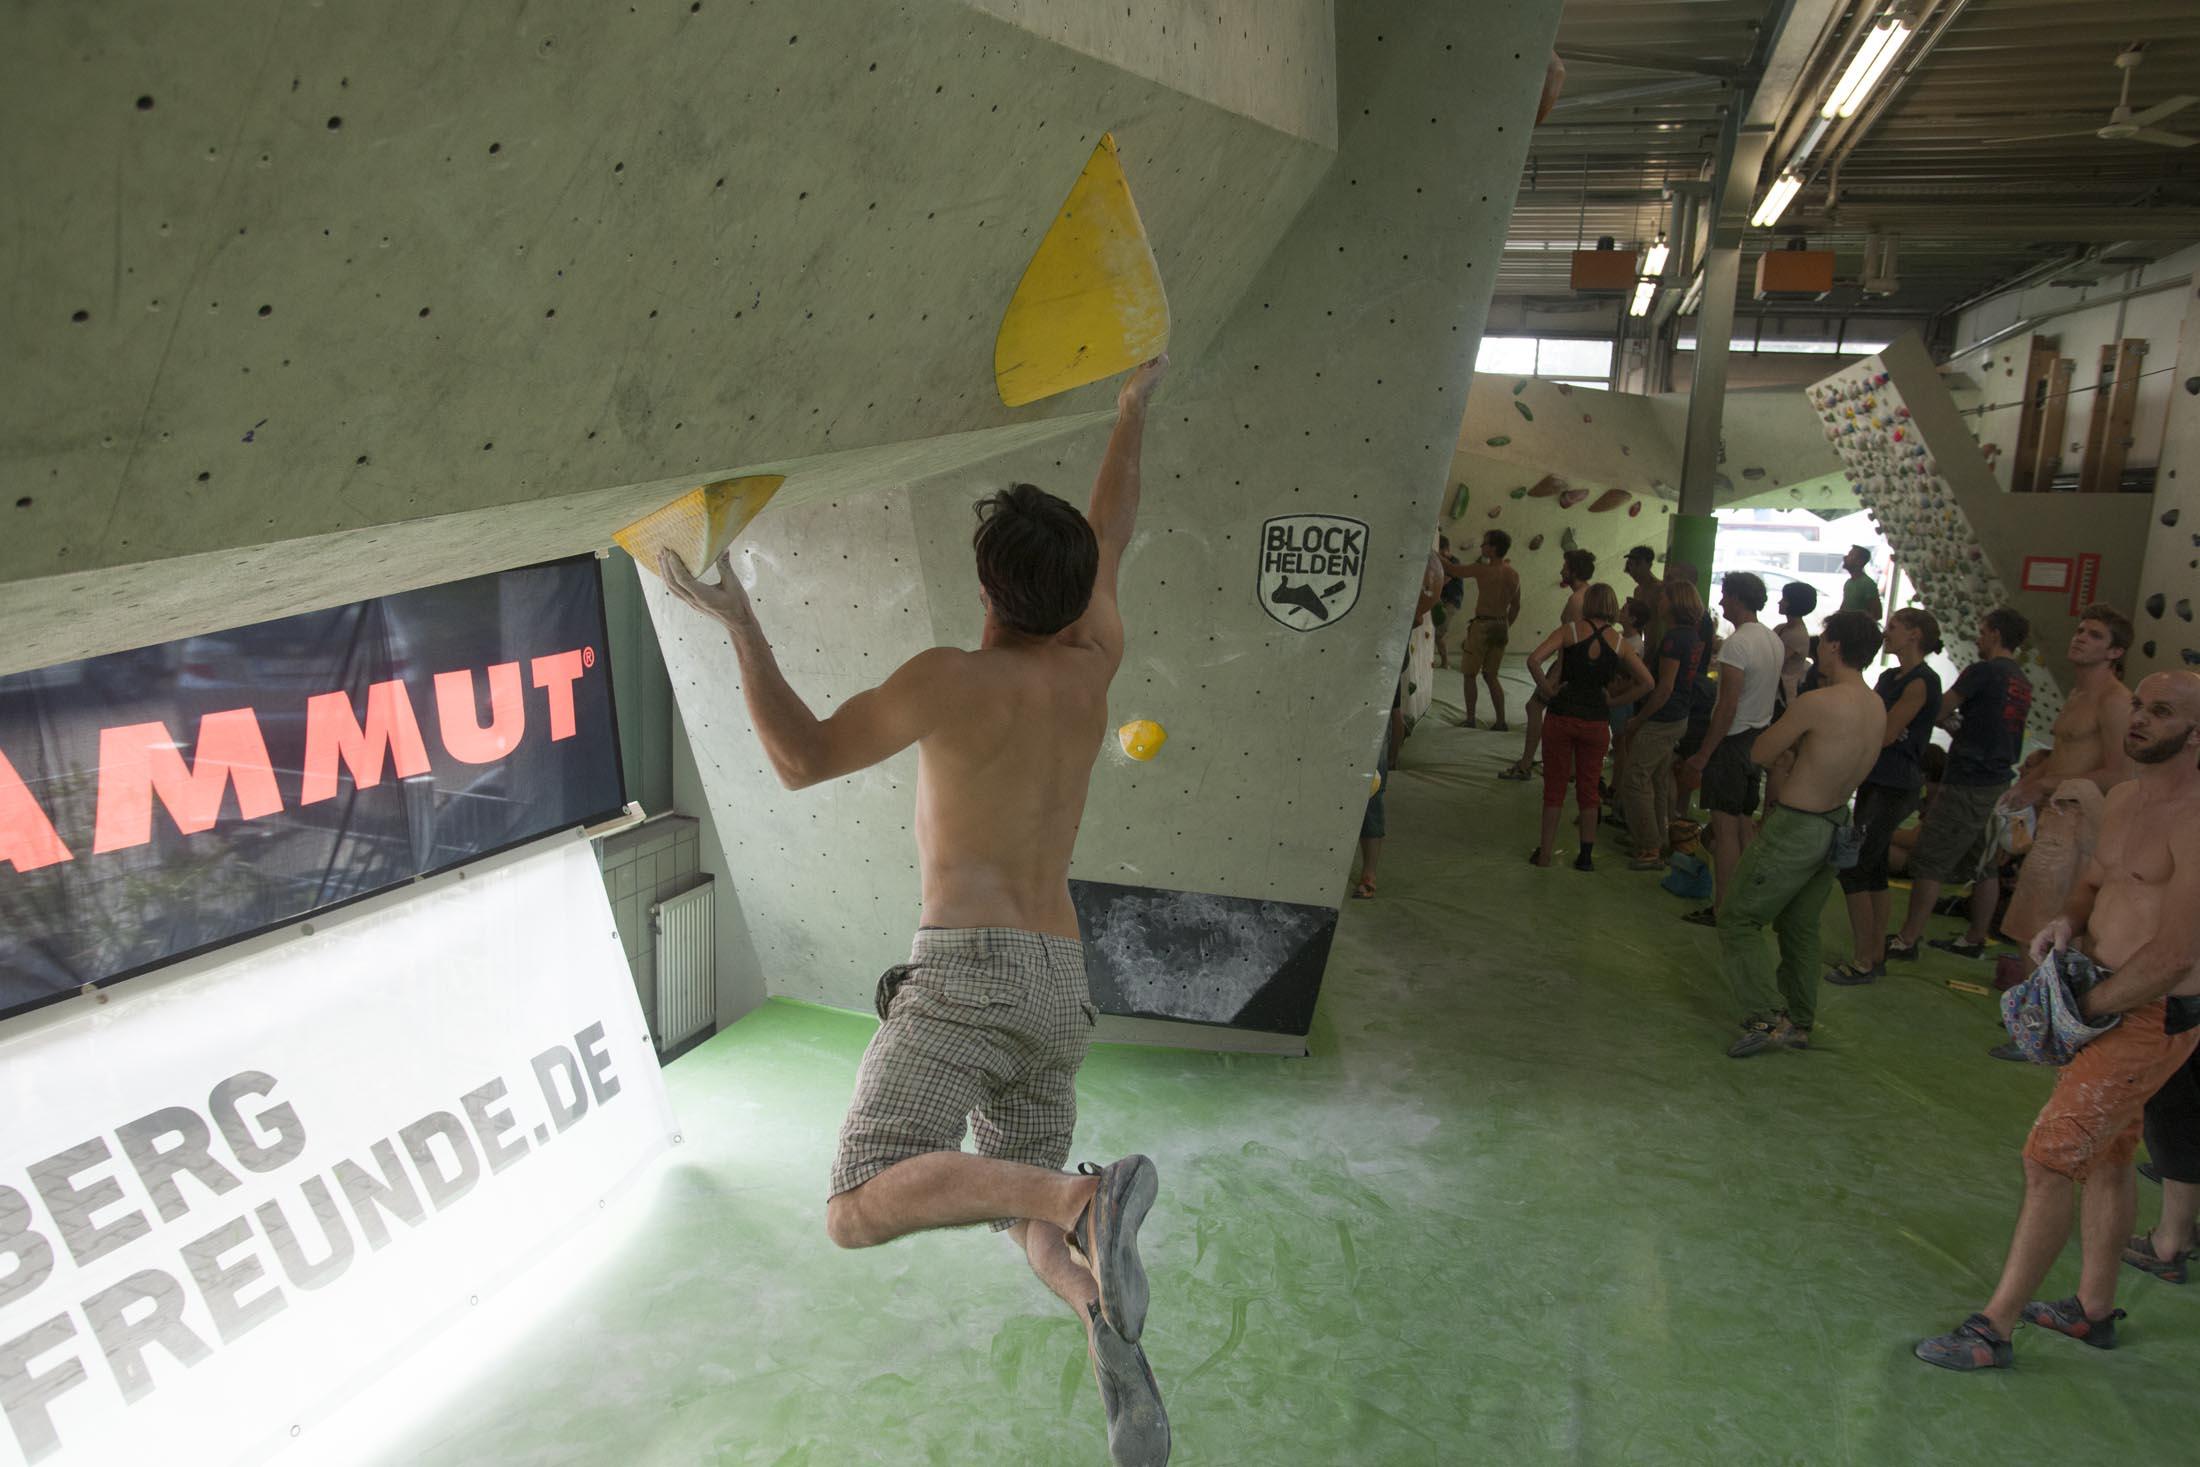 Quali, internationaler bouldercup Frankenjura 2016, BLOCKHELDEN Erlangen, Mammut, Bergfreunde.de, Boulderwettkampf07092016395